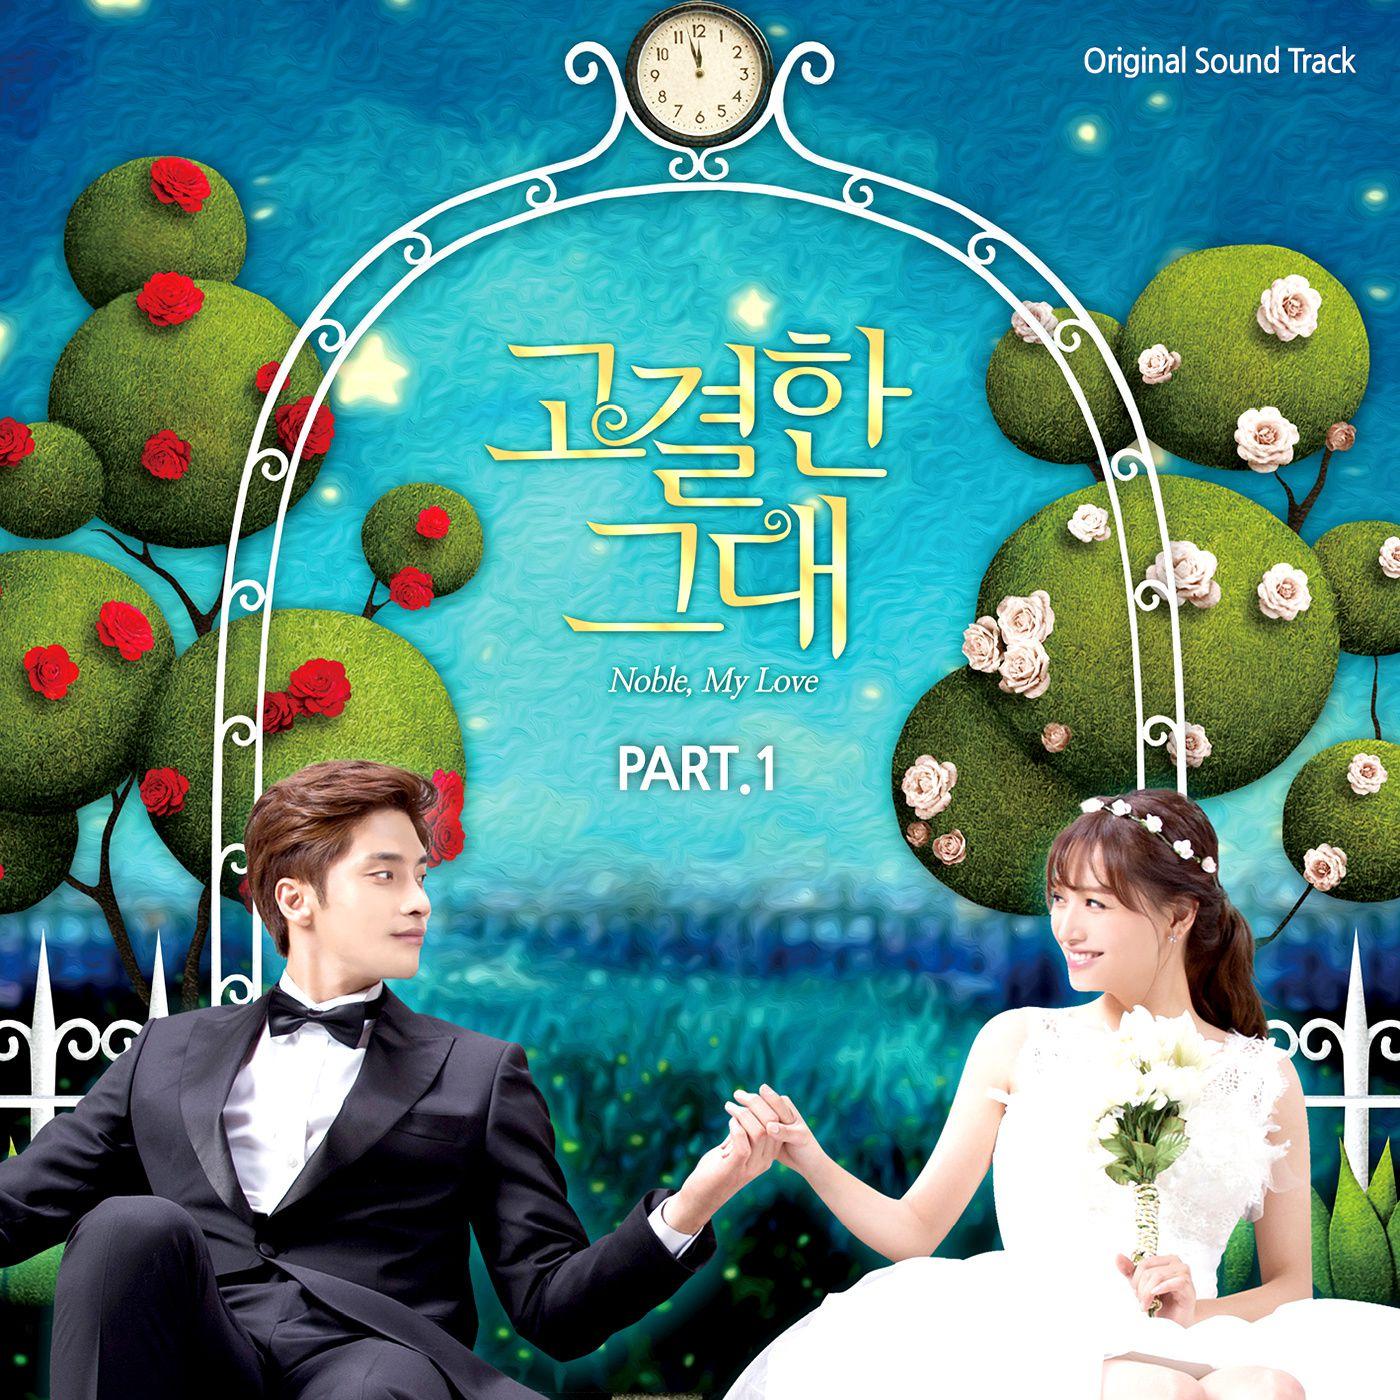 Noble my love drama recap / Shom uncle episode 1